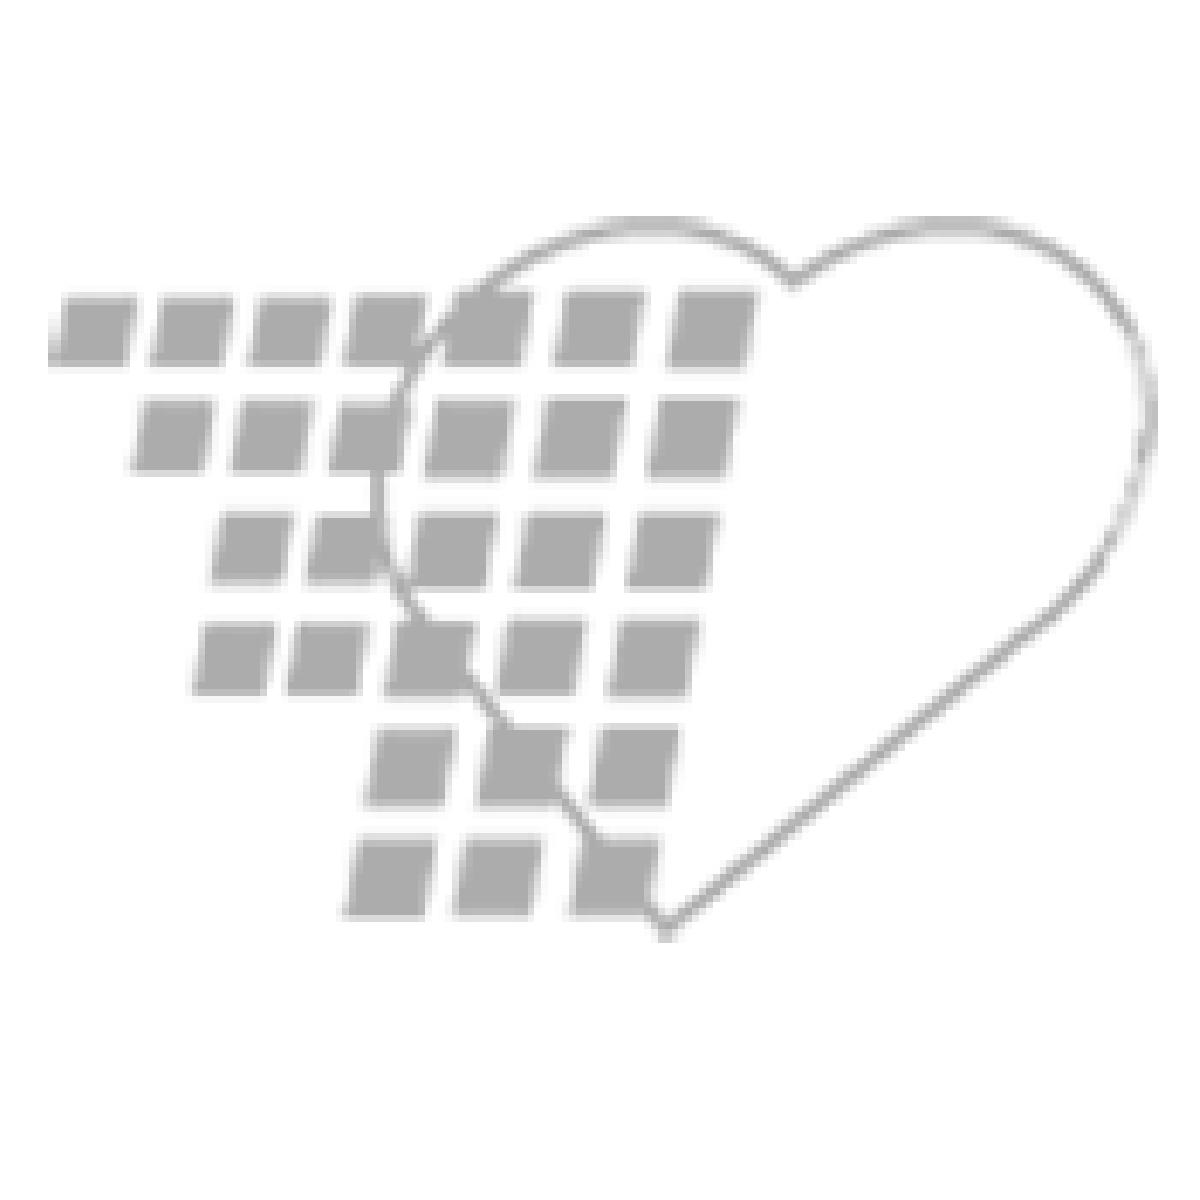 06-31-98 Pharmacy Instruction Label - STAT